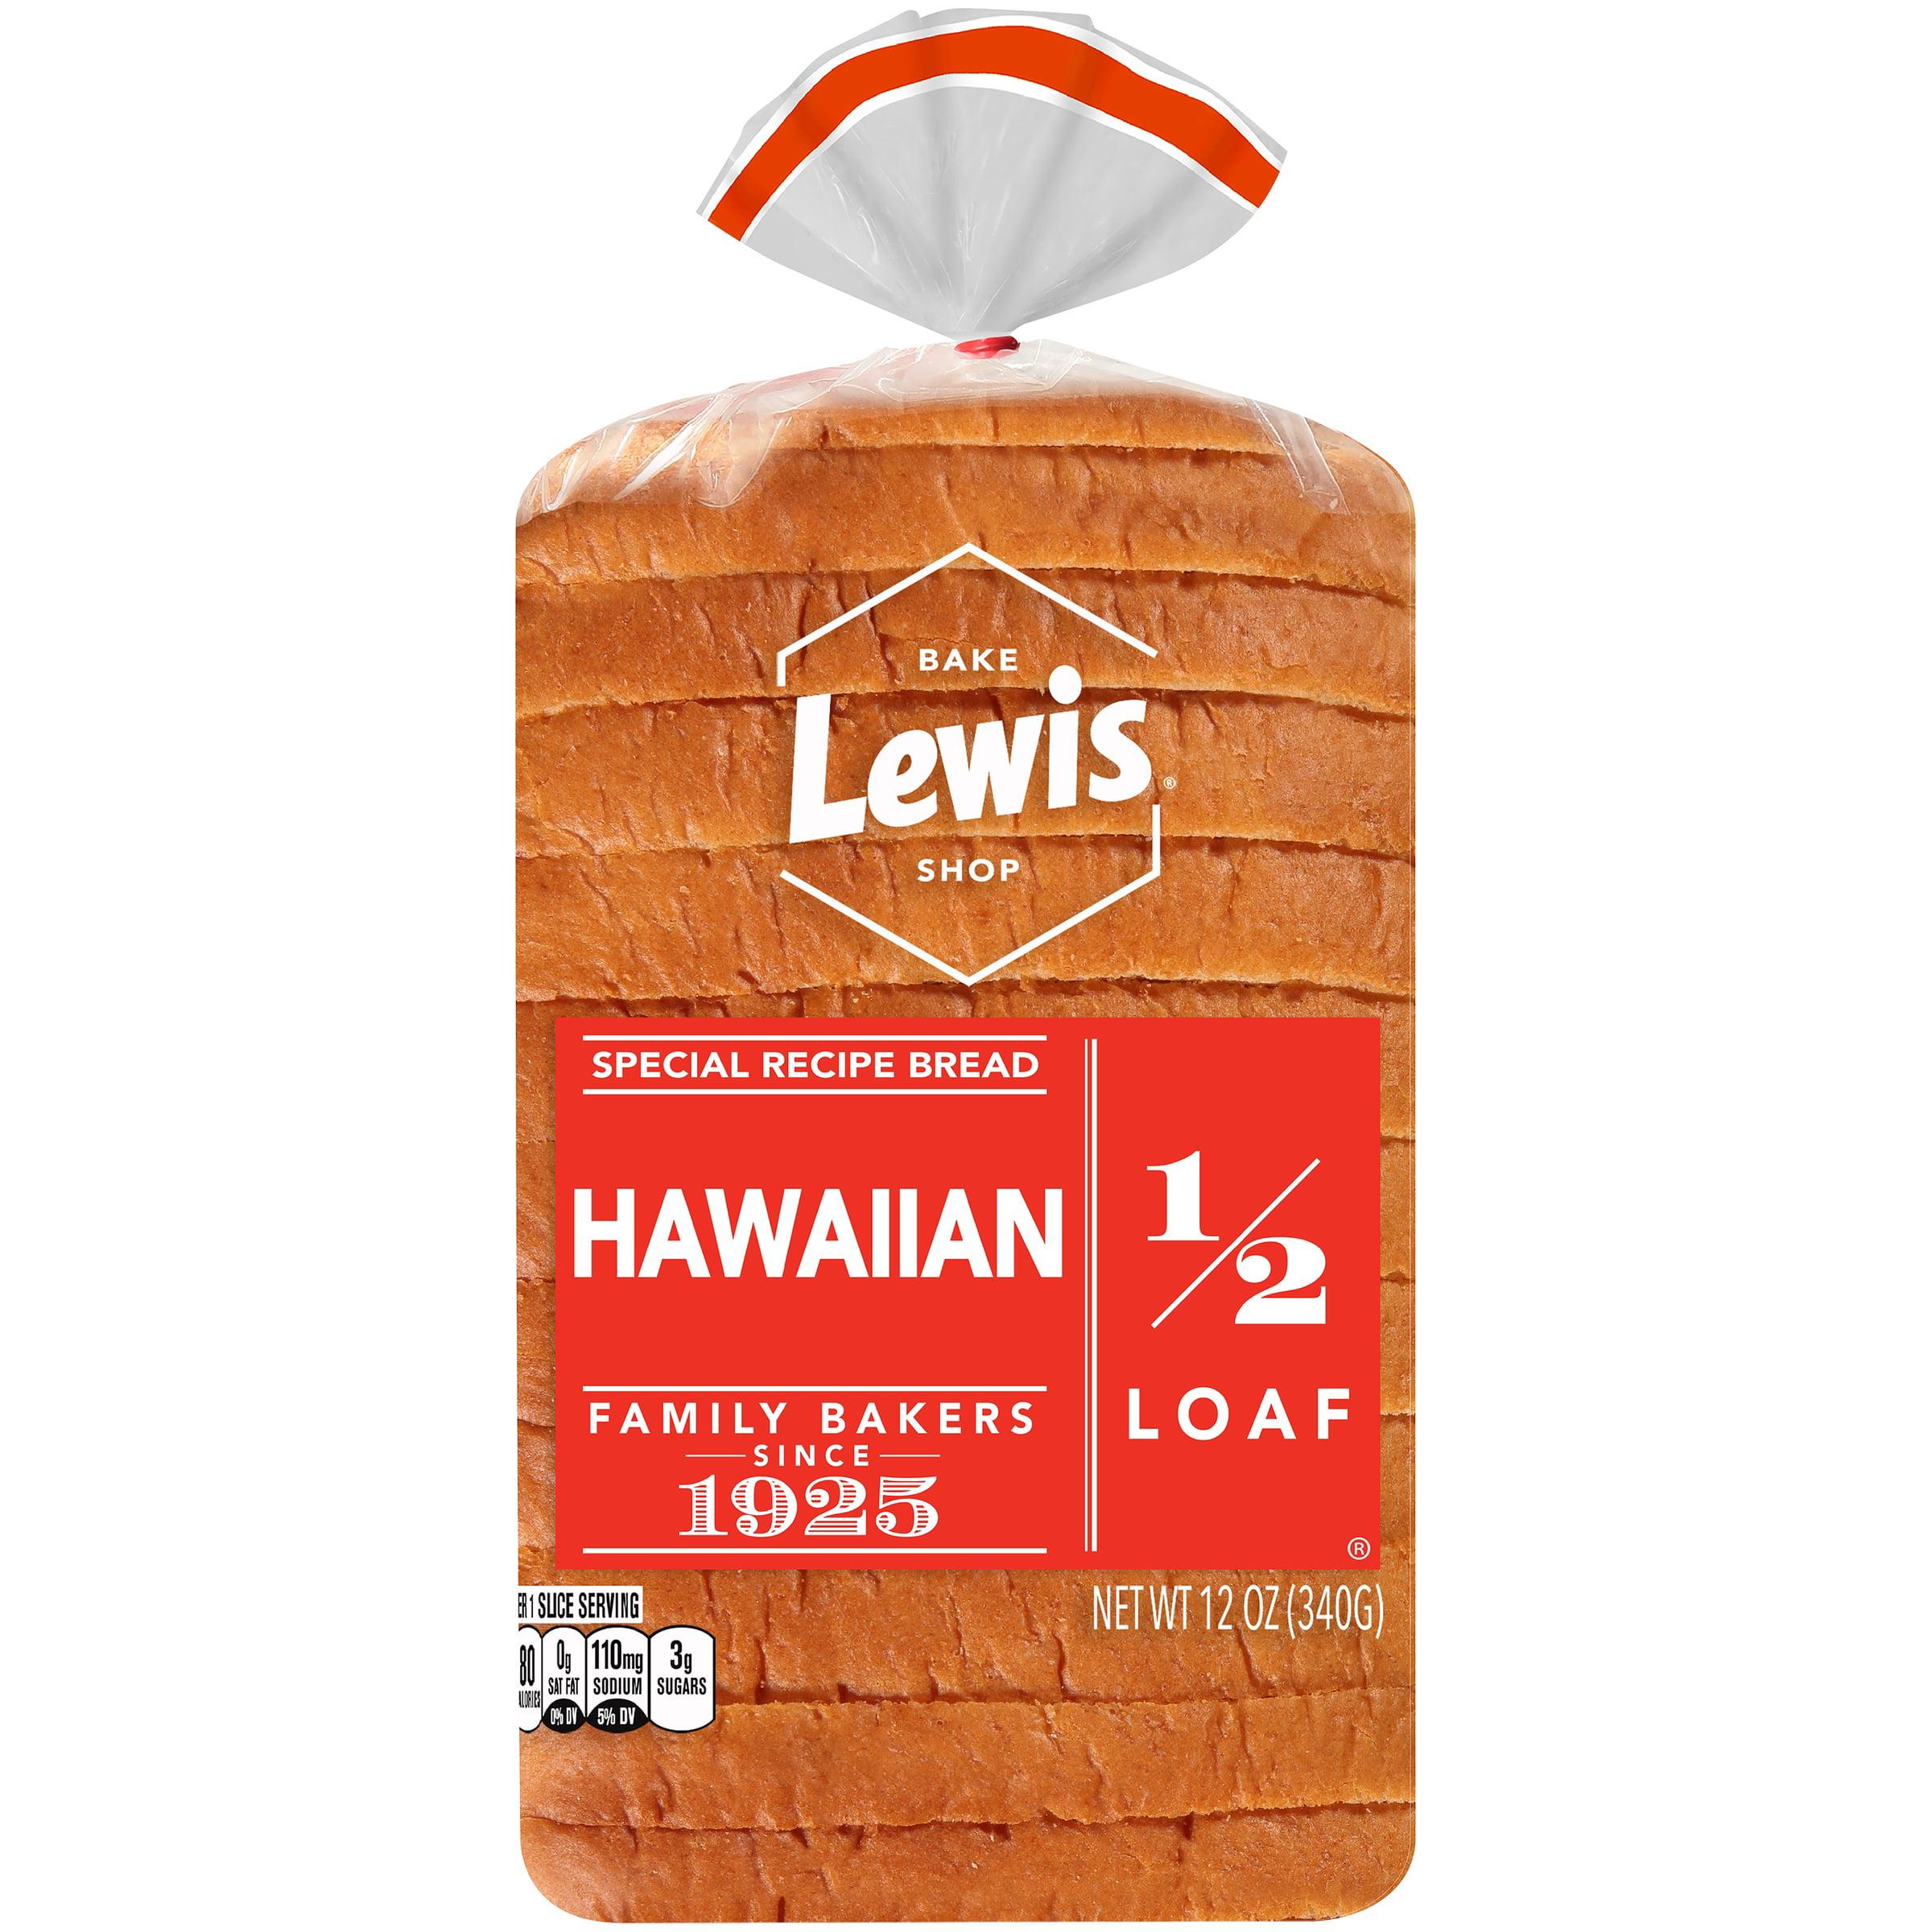 Lewis Bake Shop Half Loaf Hawaiian Special Recipe Bread, 1/2 Loaf, 12 oz.